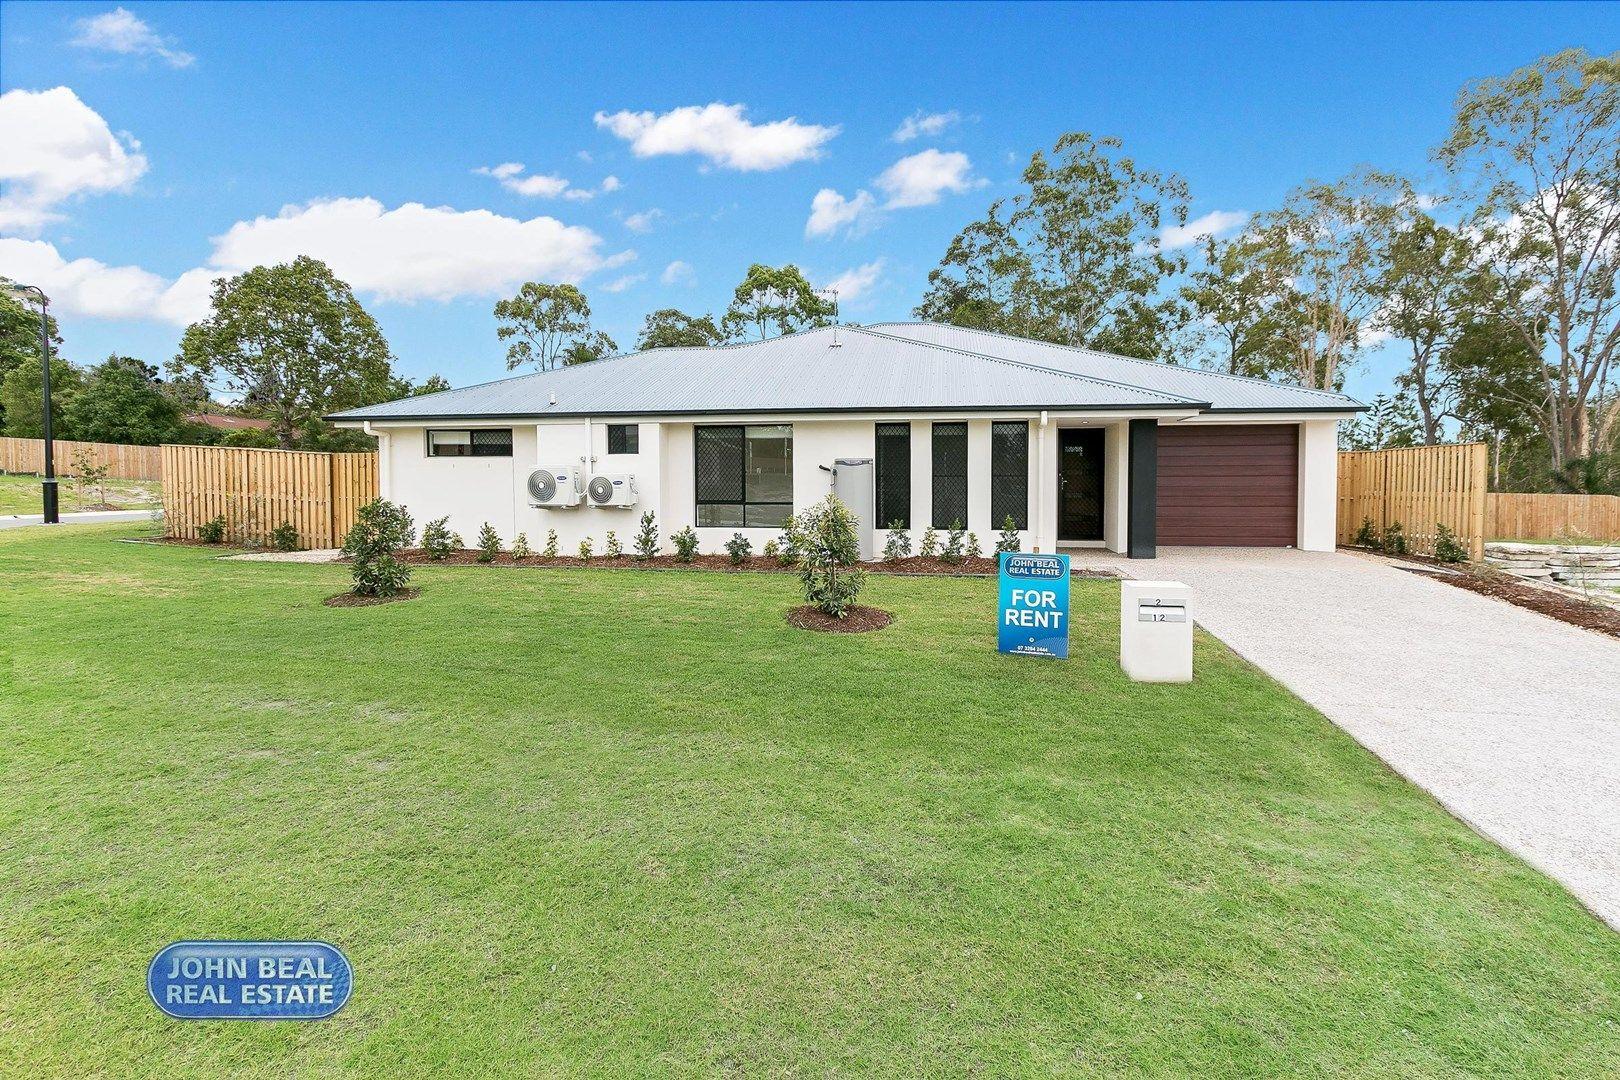 Duplex 2/12 Weyba St, Morayfield QLD 4506, Image 0